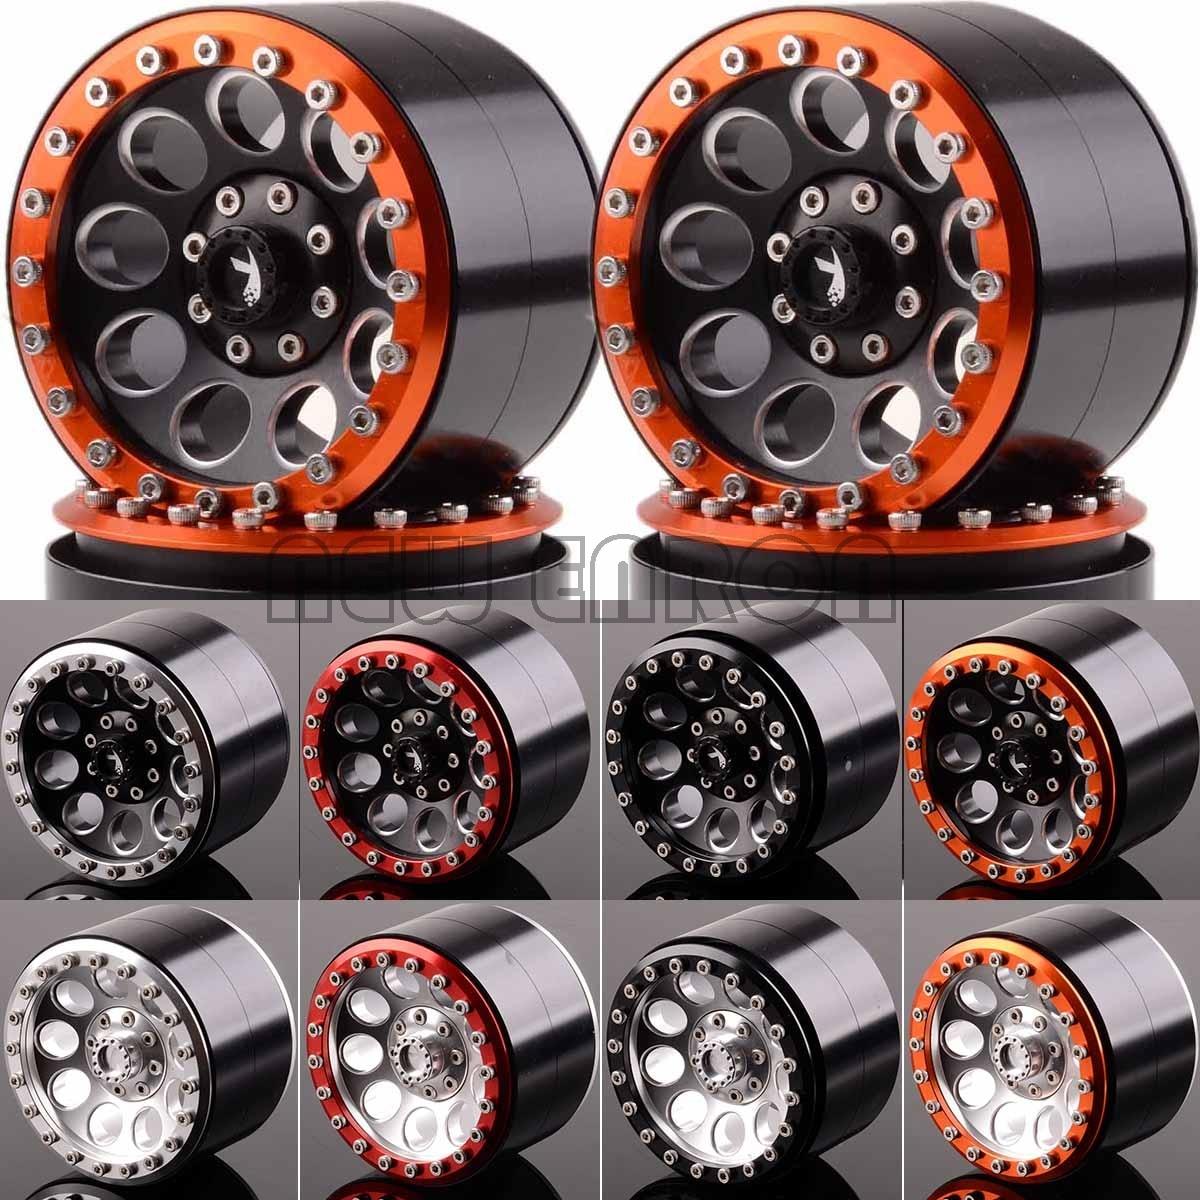 NEW ENRON 4P Aluminum 2.2 Inch Beadlock Wheel Rim Fit FOR RC Rock Crawler Axial SCX10 RR10 Wraith 90048 90018 Traxxas TRX4